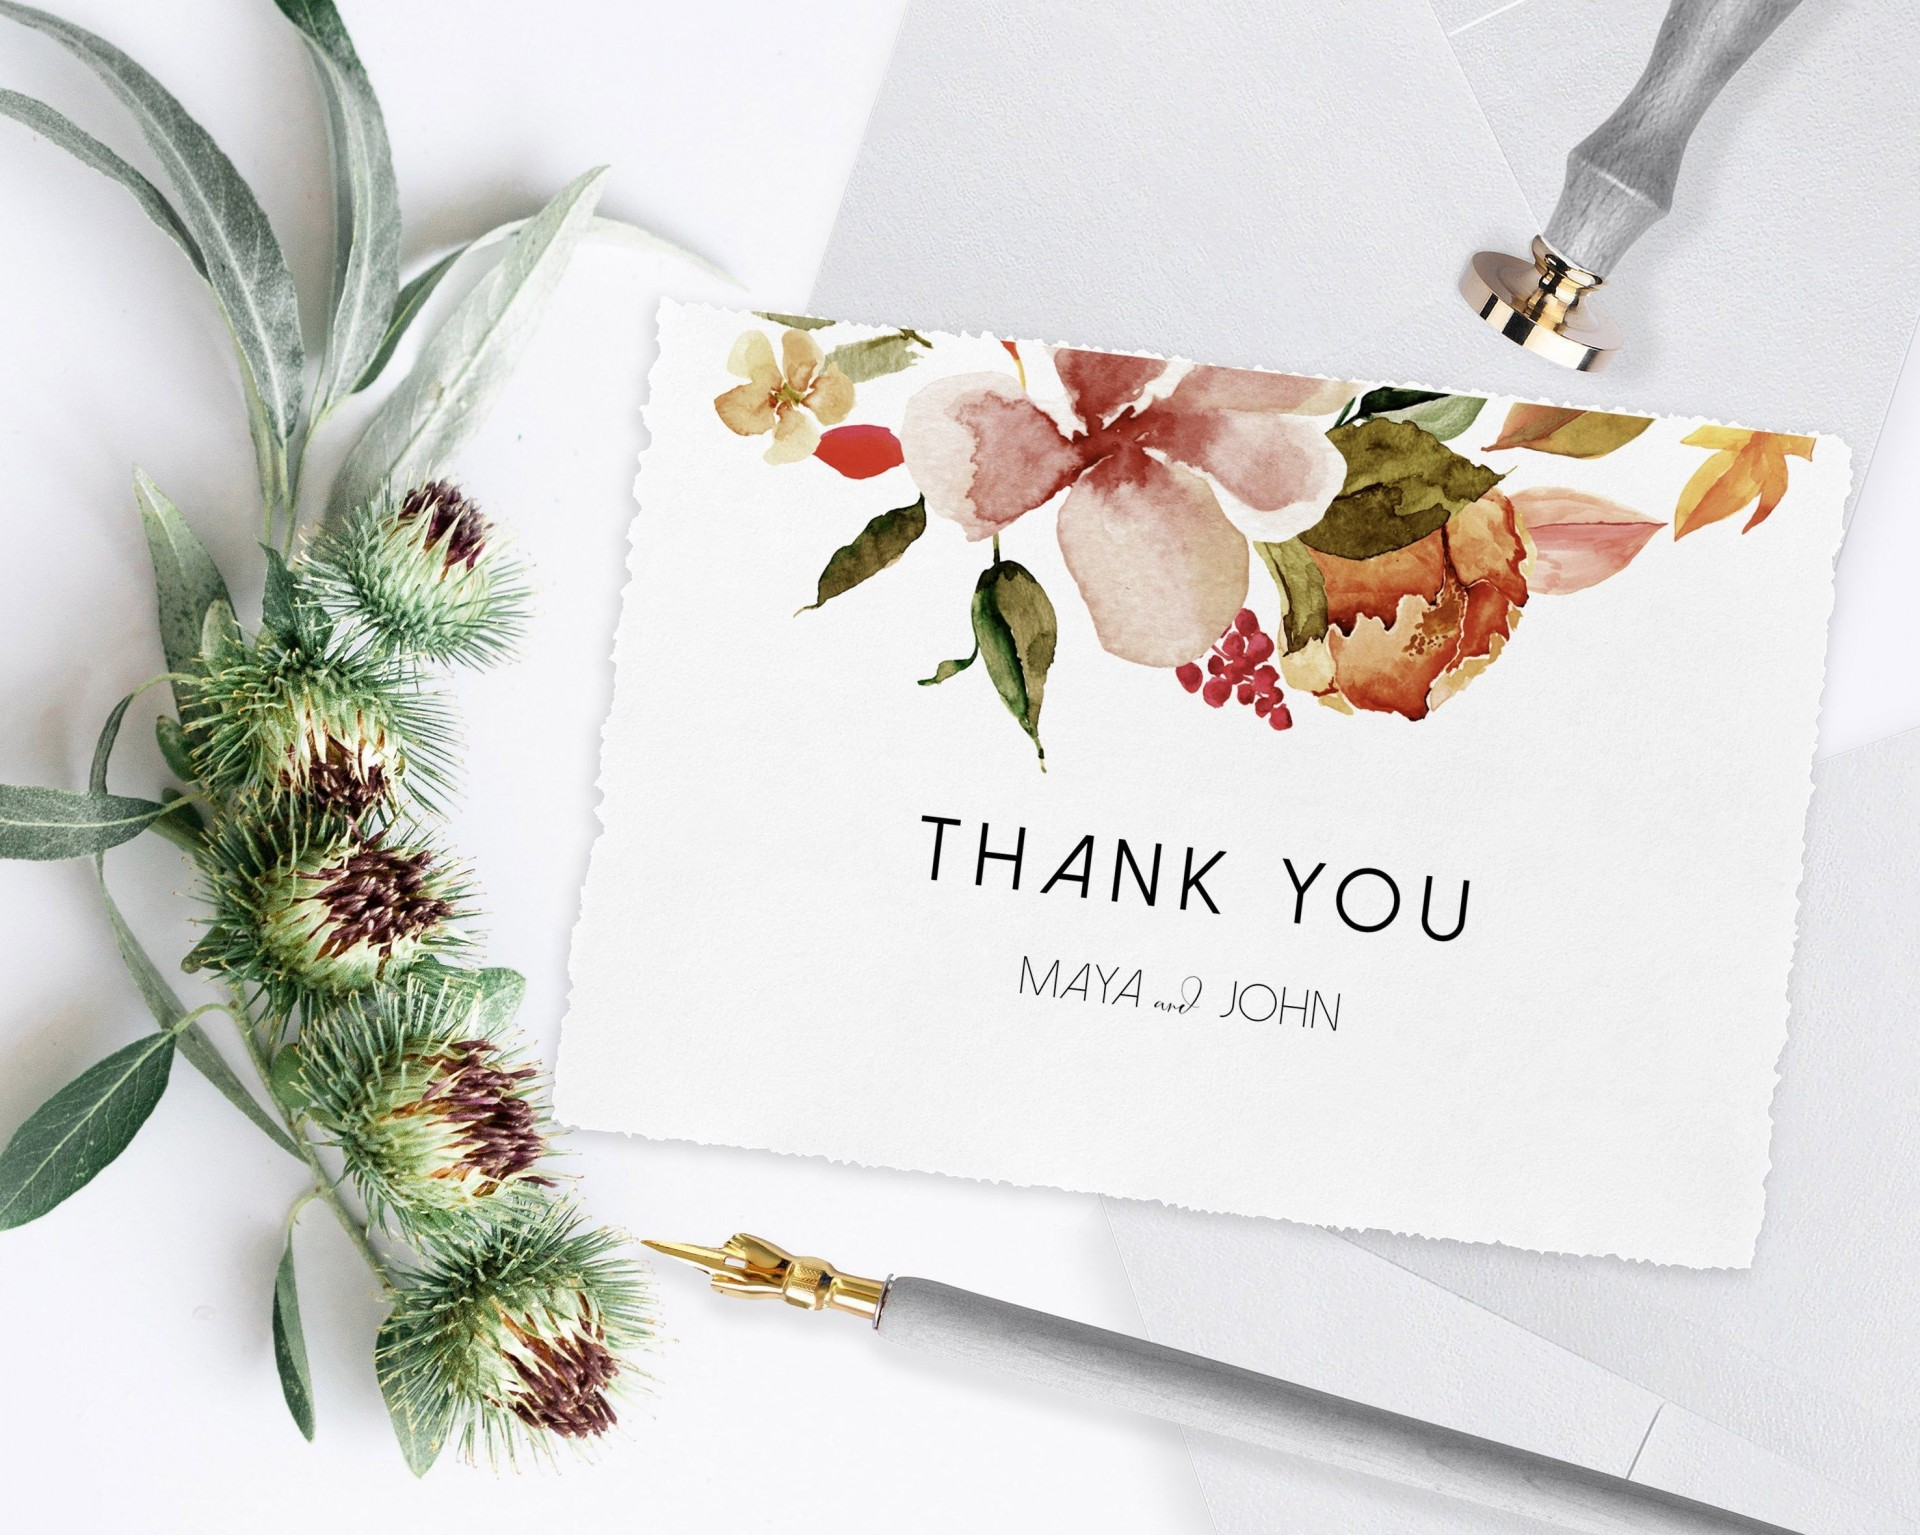 003 Incredible Diy Wedding Thank You Card Template High Resolution  Templates1920